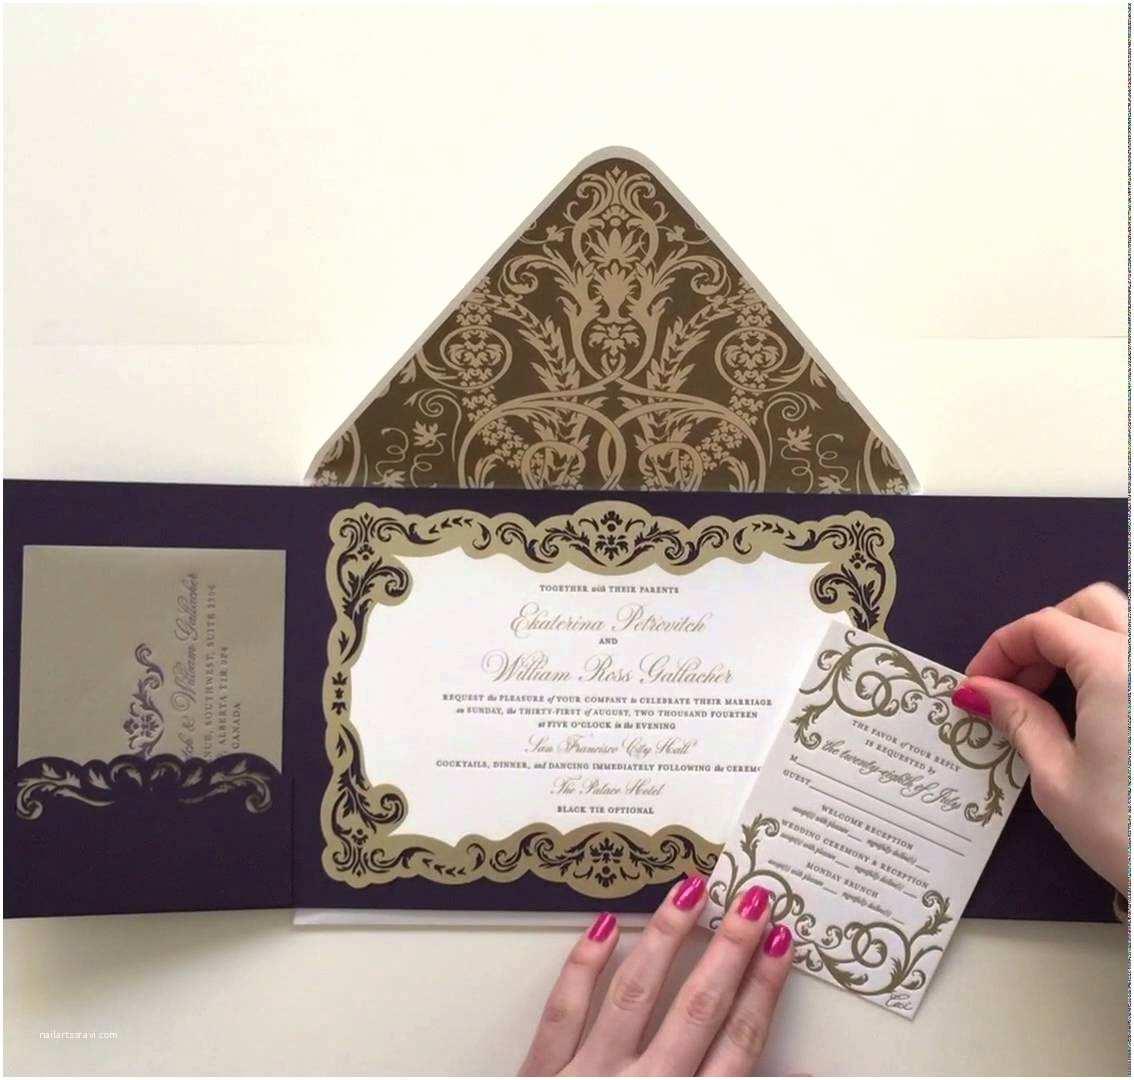 New Wedding Invitations Luxury Gatefold Wedding Invitation by Ceci New York